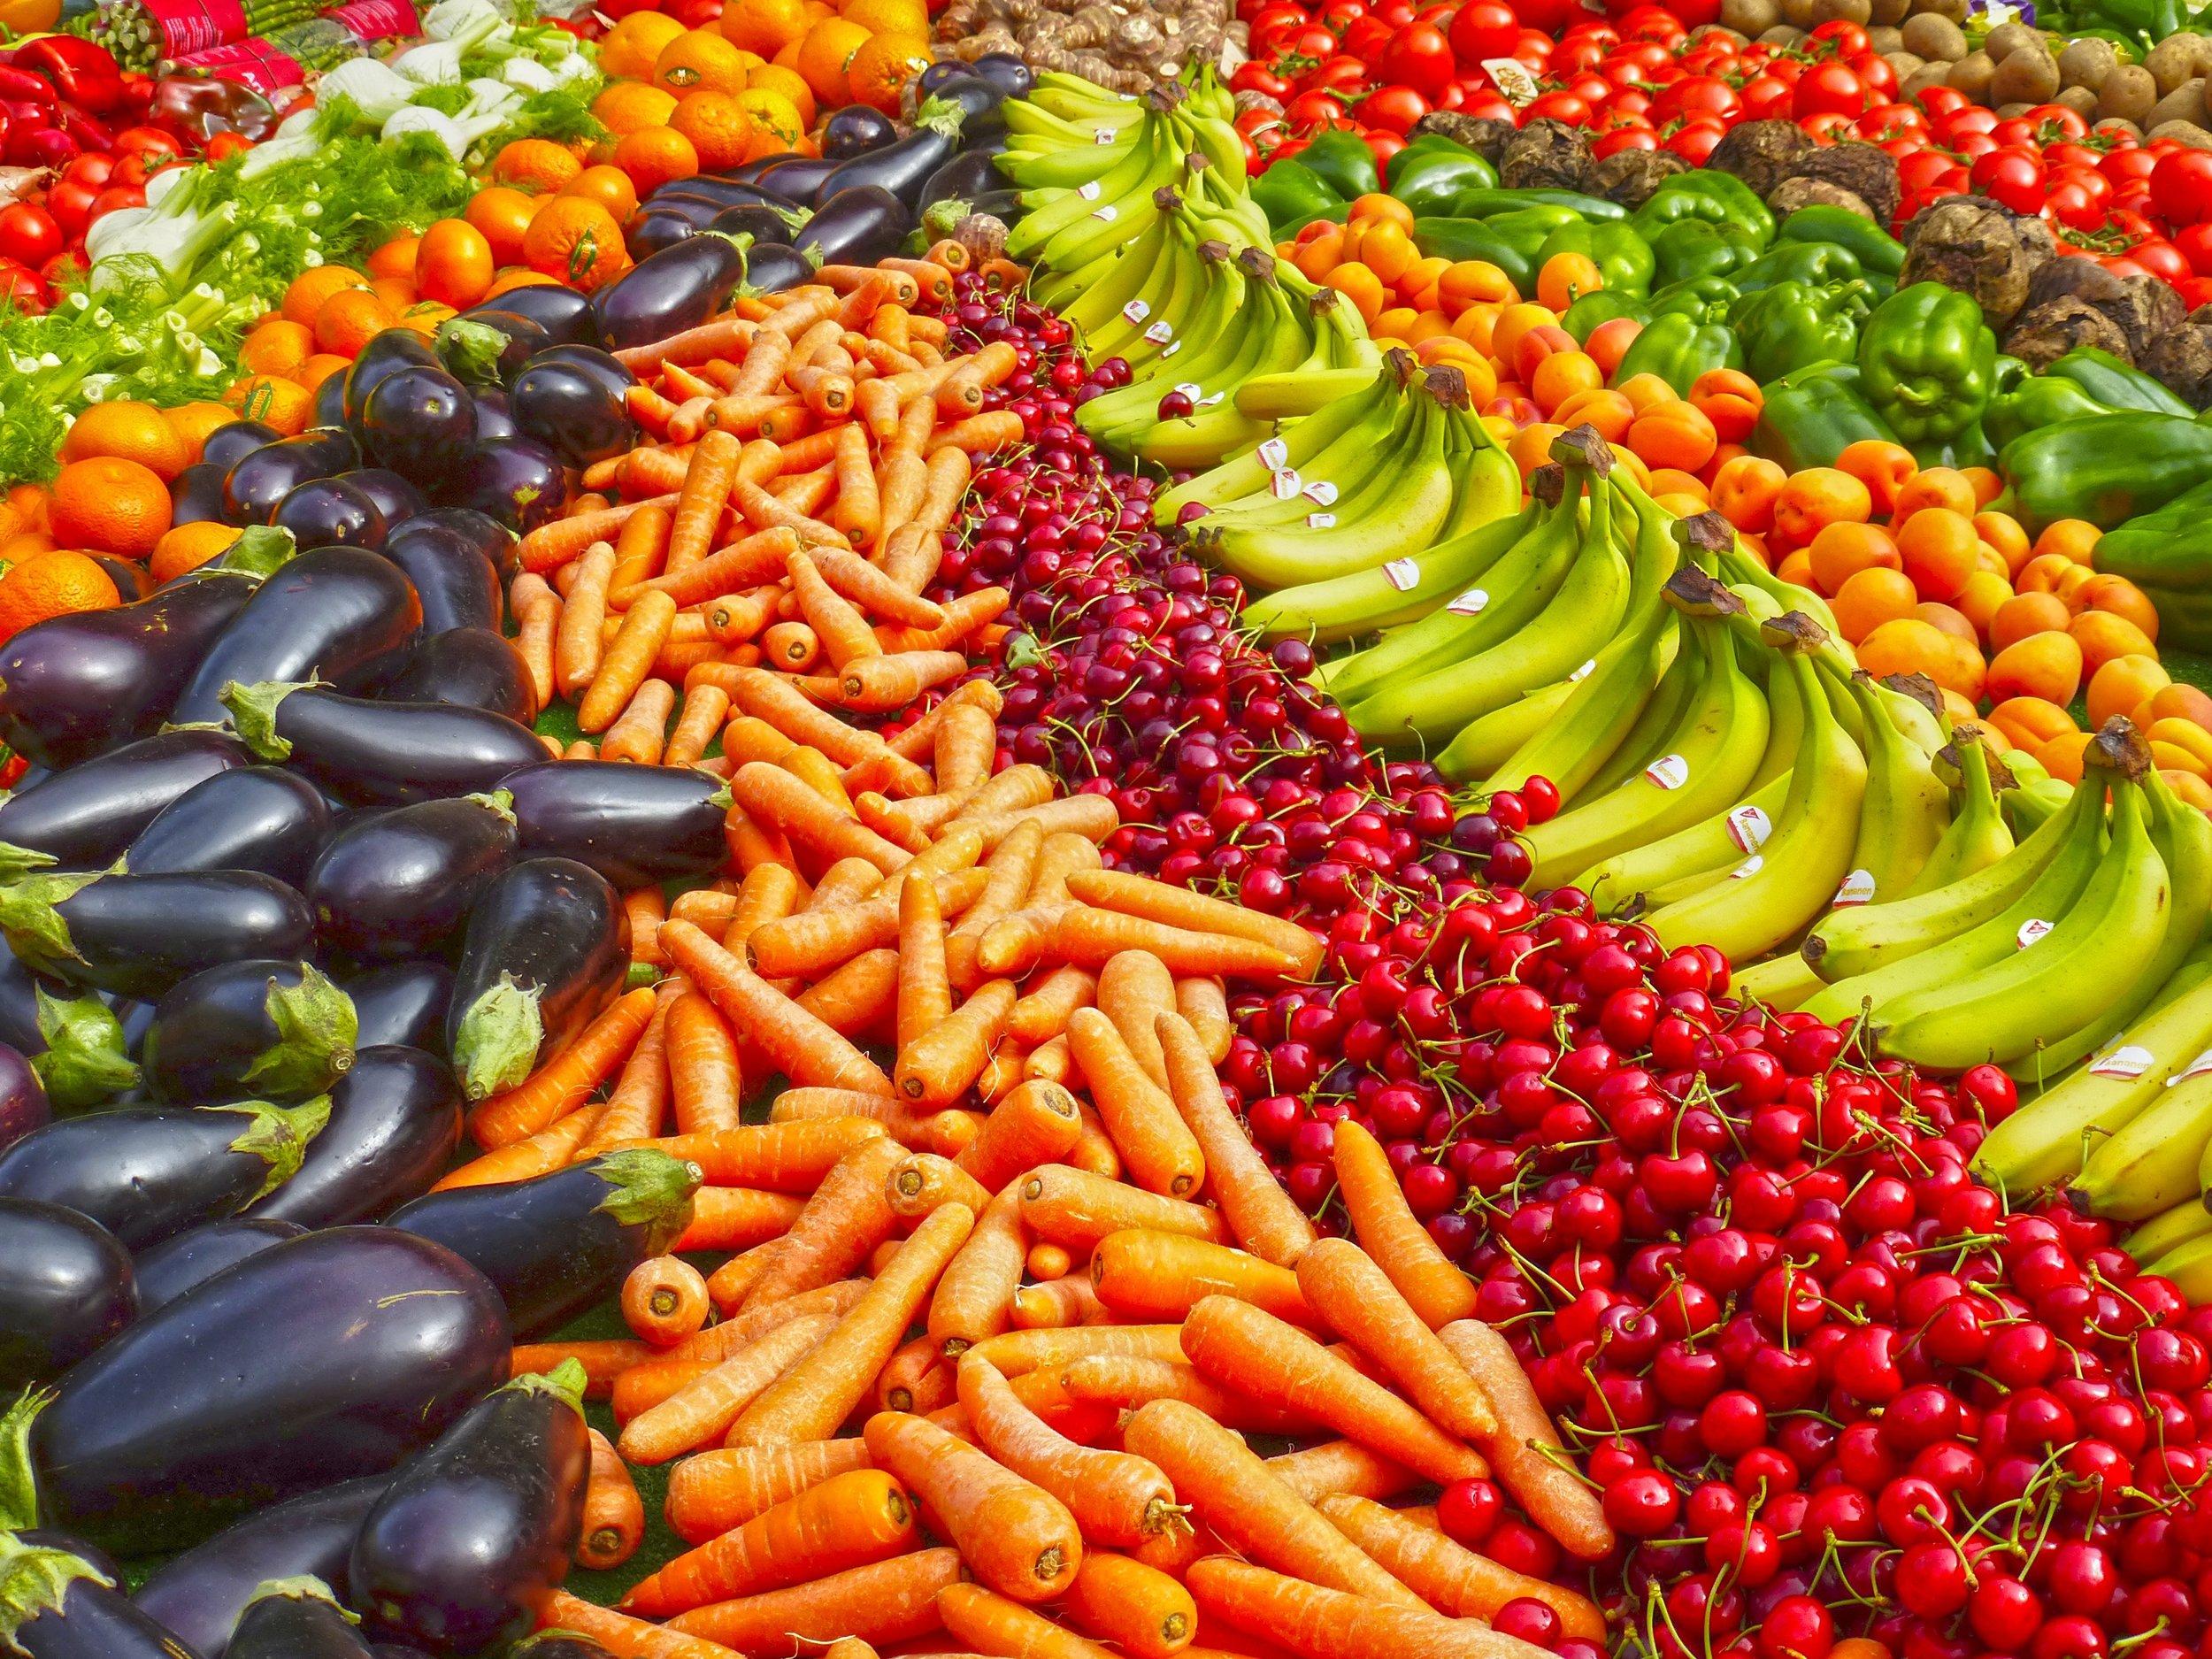 105 abundance-agriculture-bananas-264537.jpg